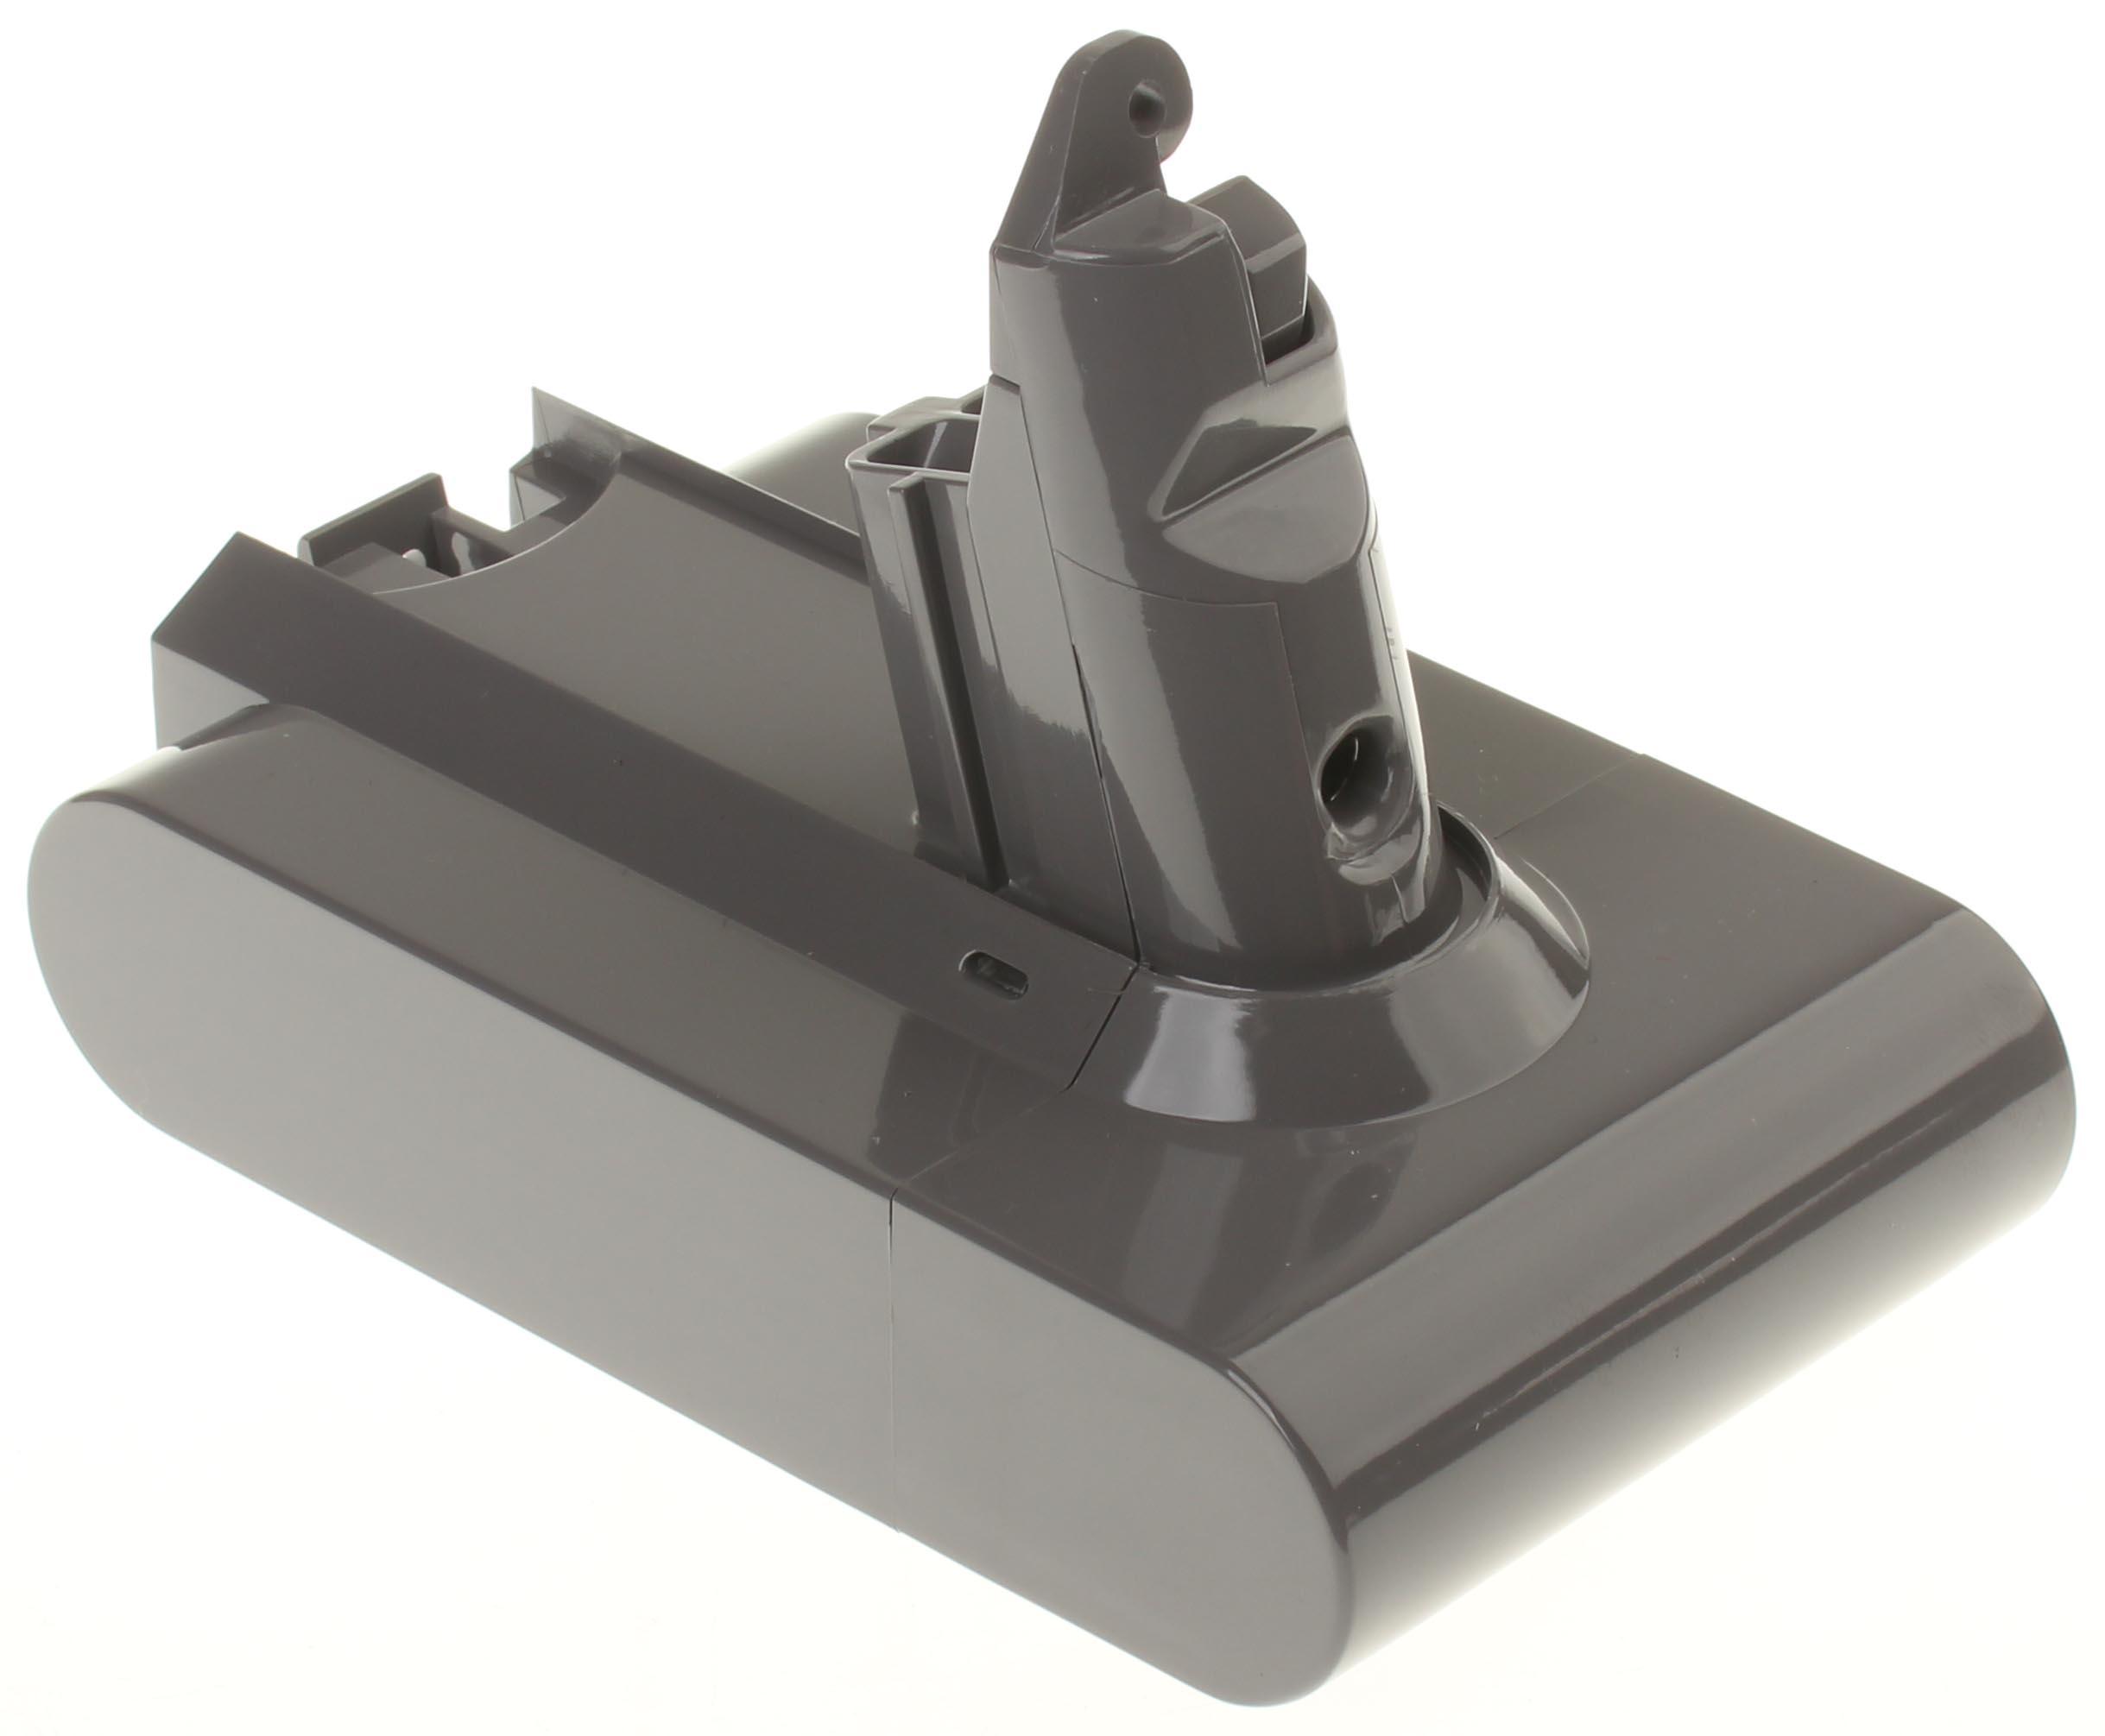 Аккумулятор dyson dc62 купить в москве dyson pdf